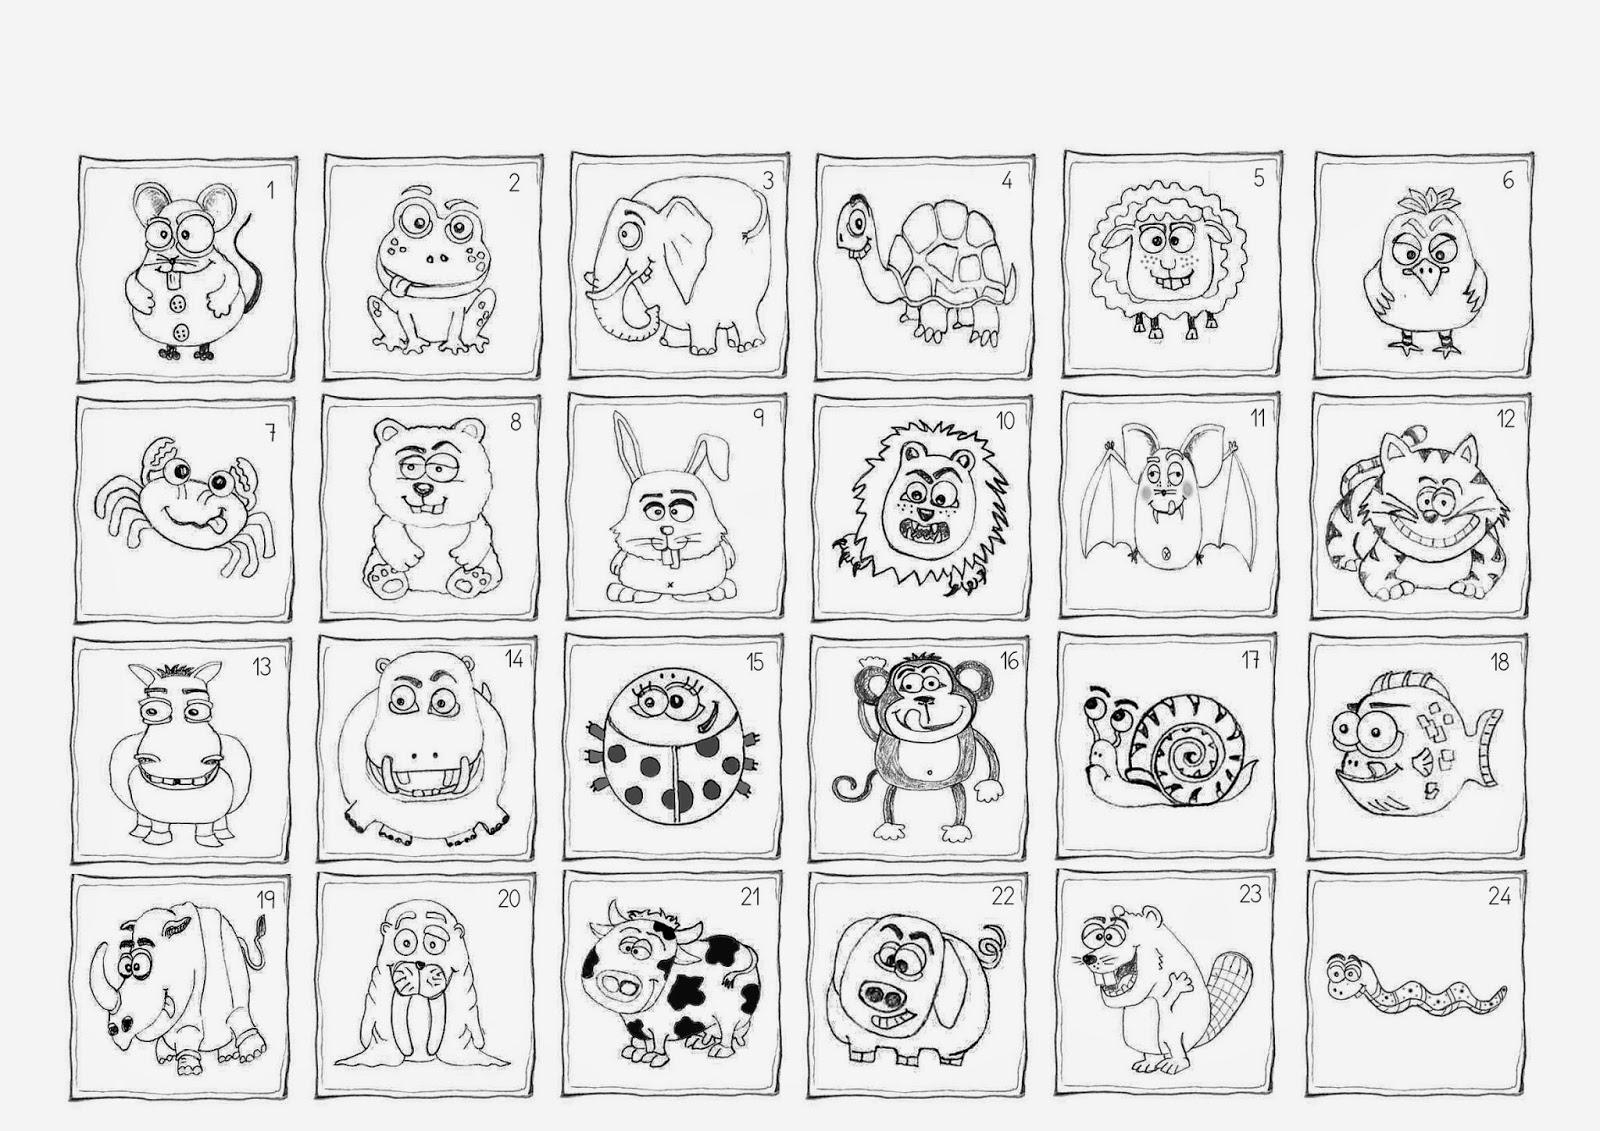 Pinturas y dibujos VGMONNZO Dibujos lineales infantiles